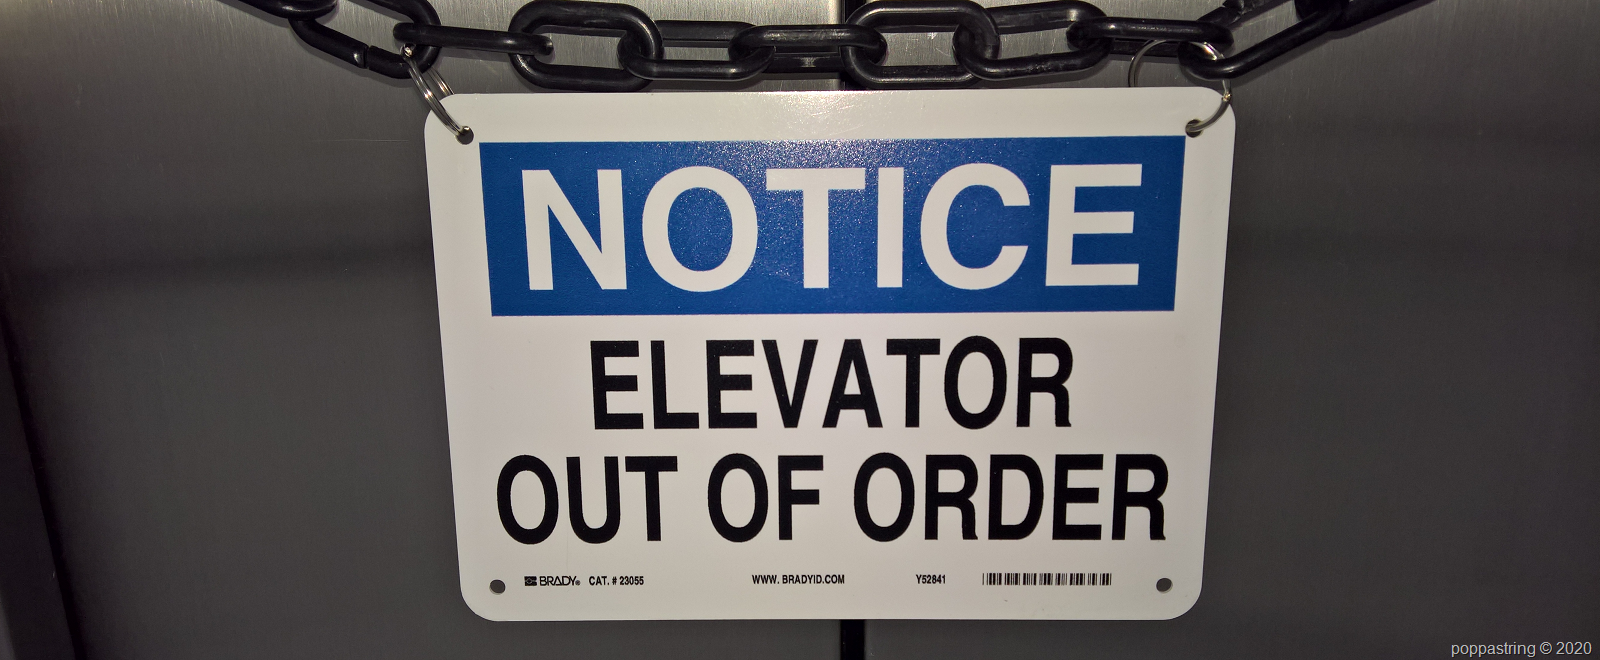 Notive elevator out of order